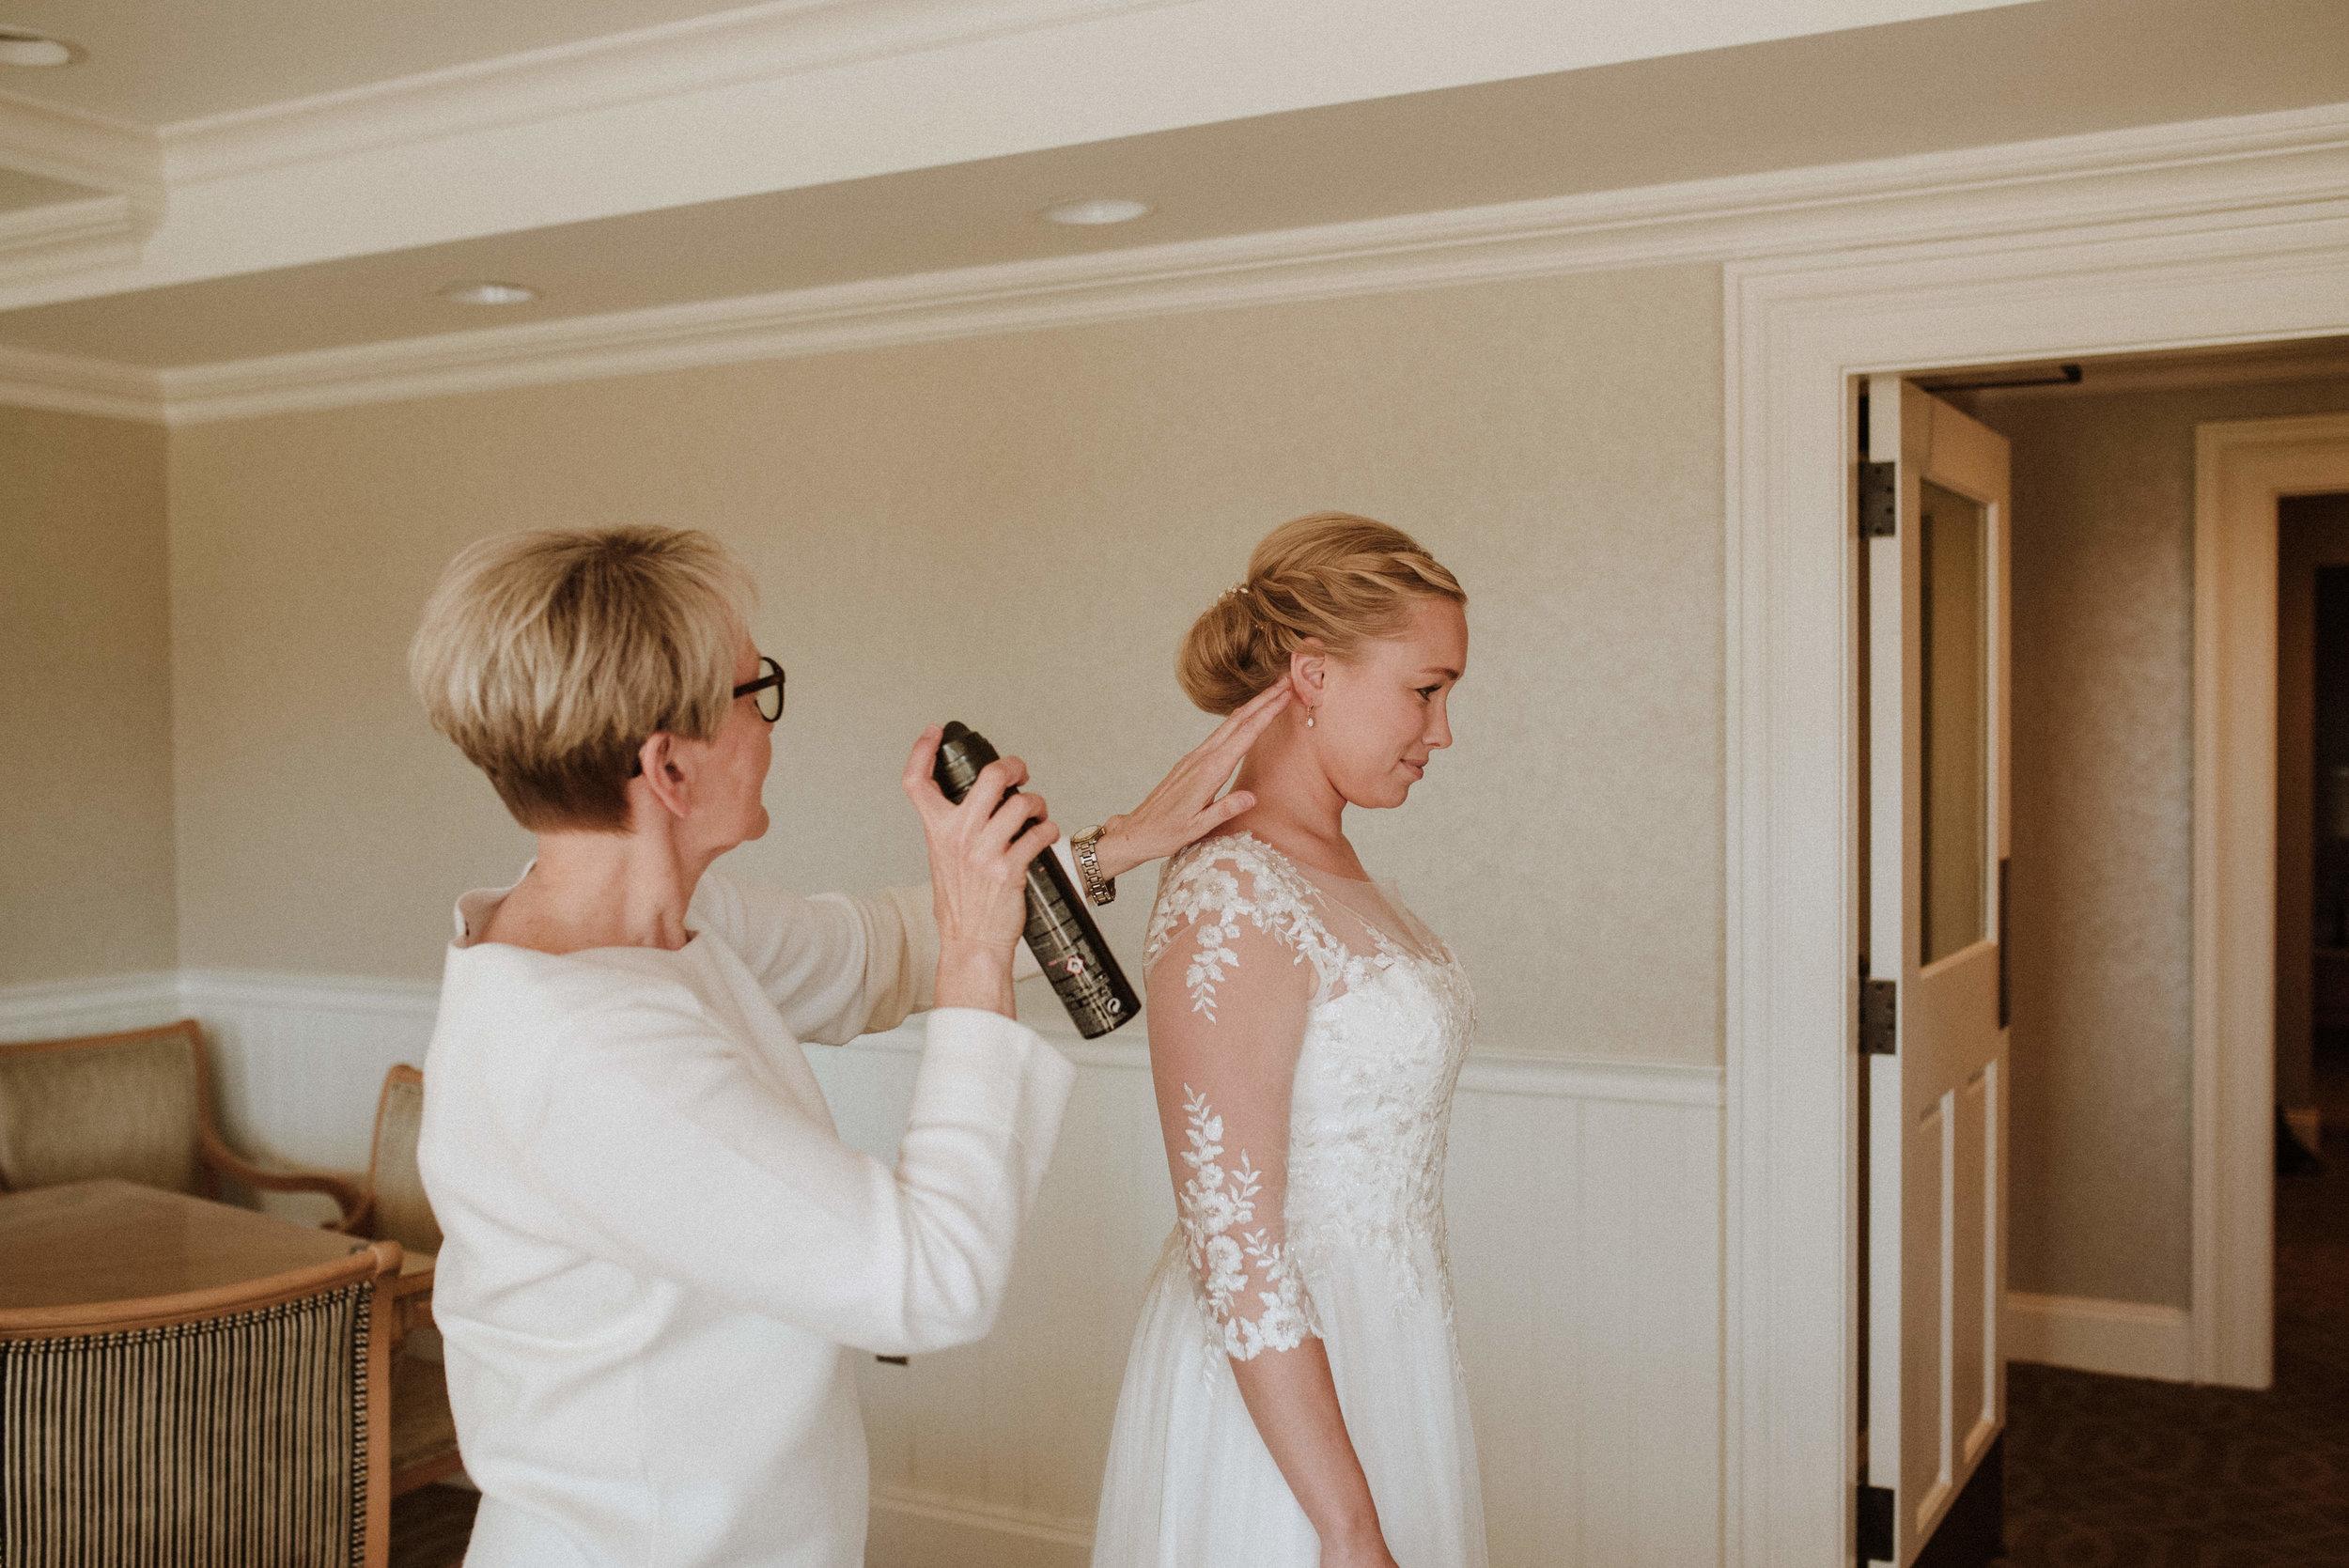 ApkePhotography_K+M_Wedding_10.jpg